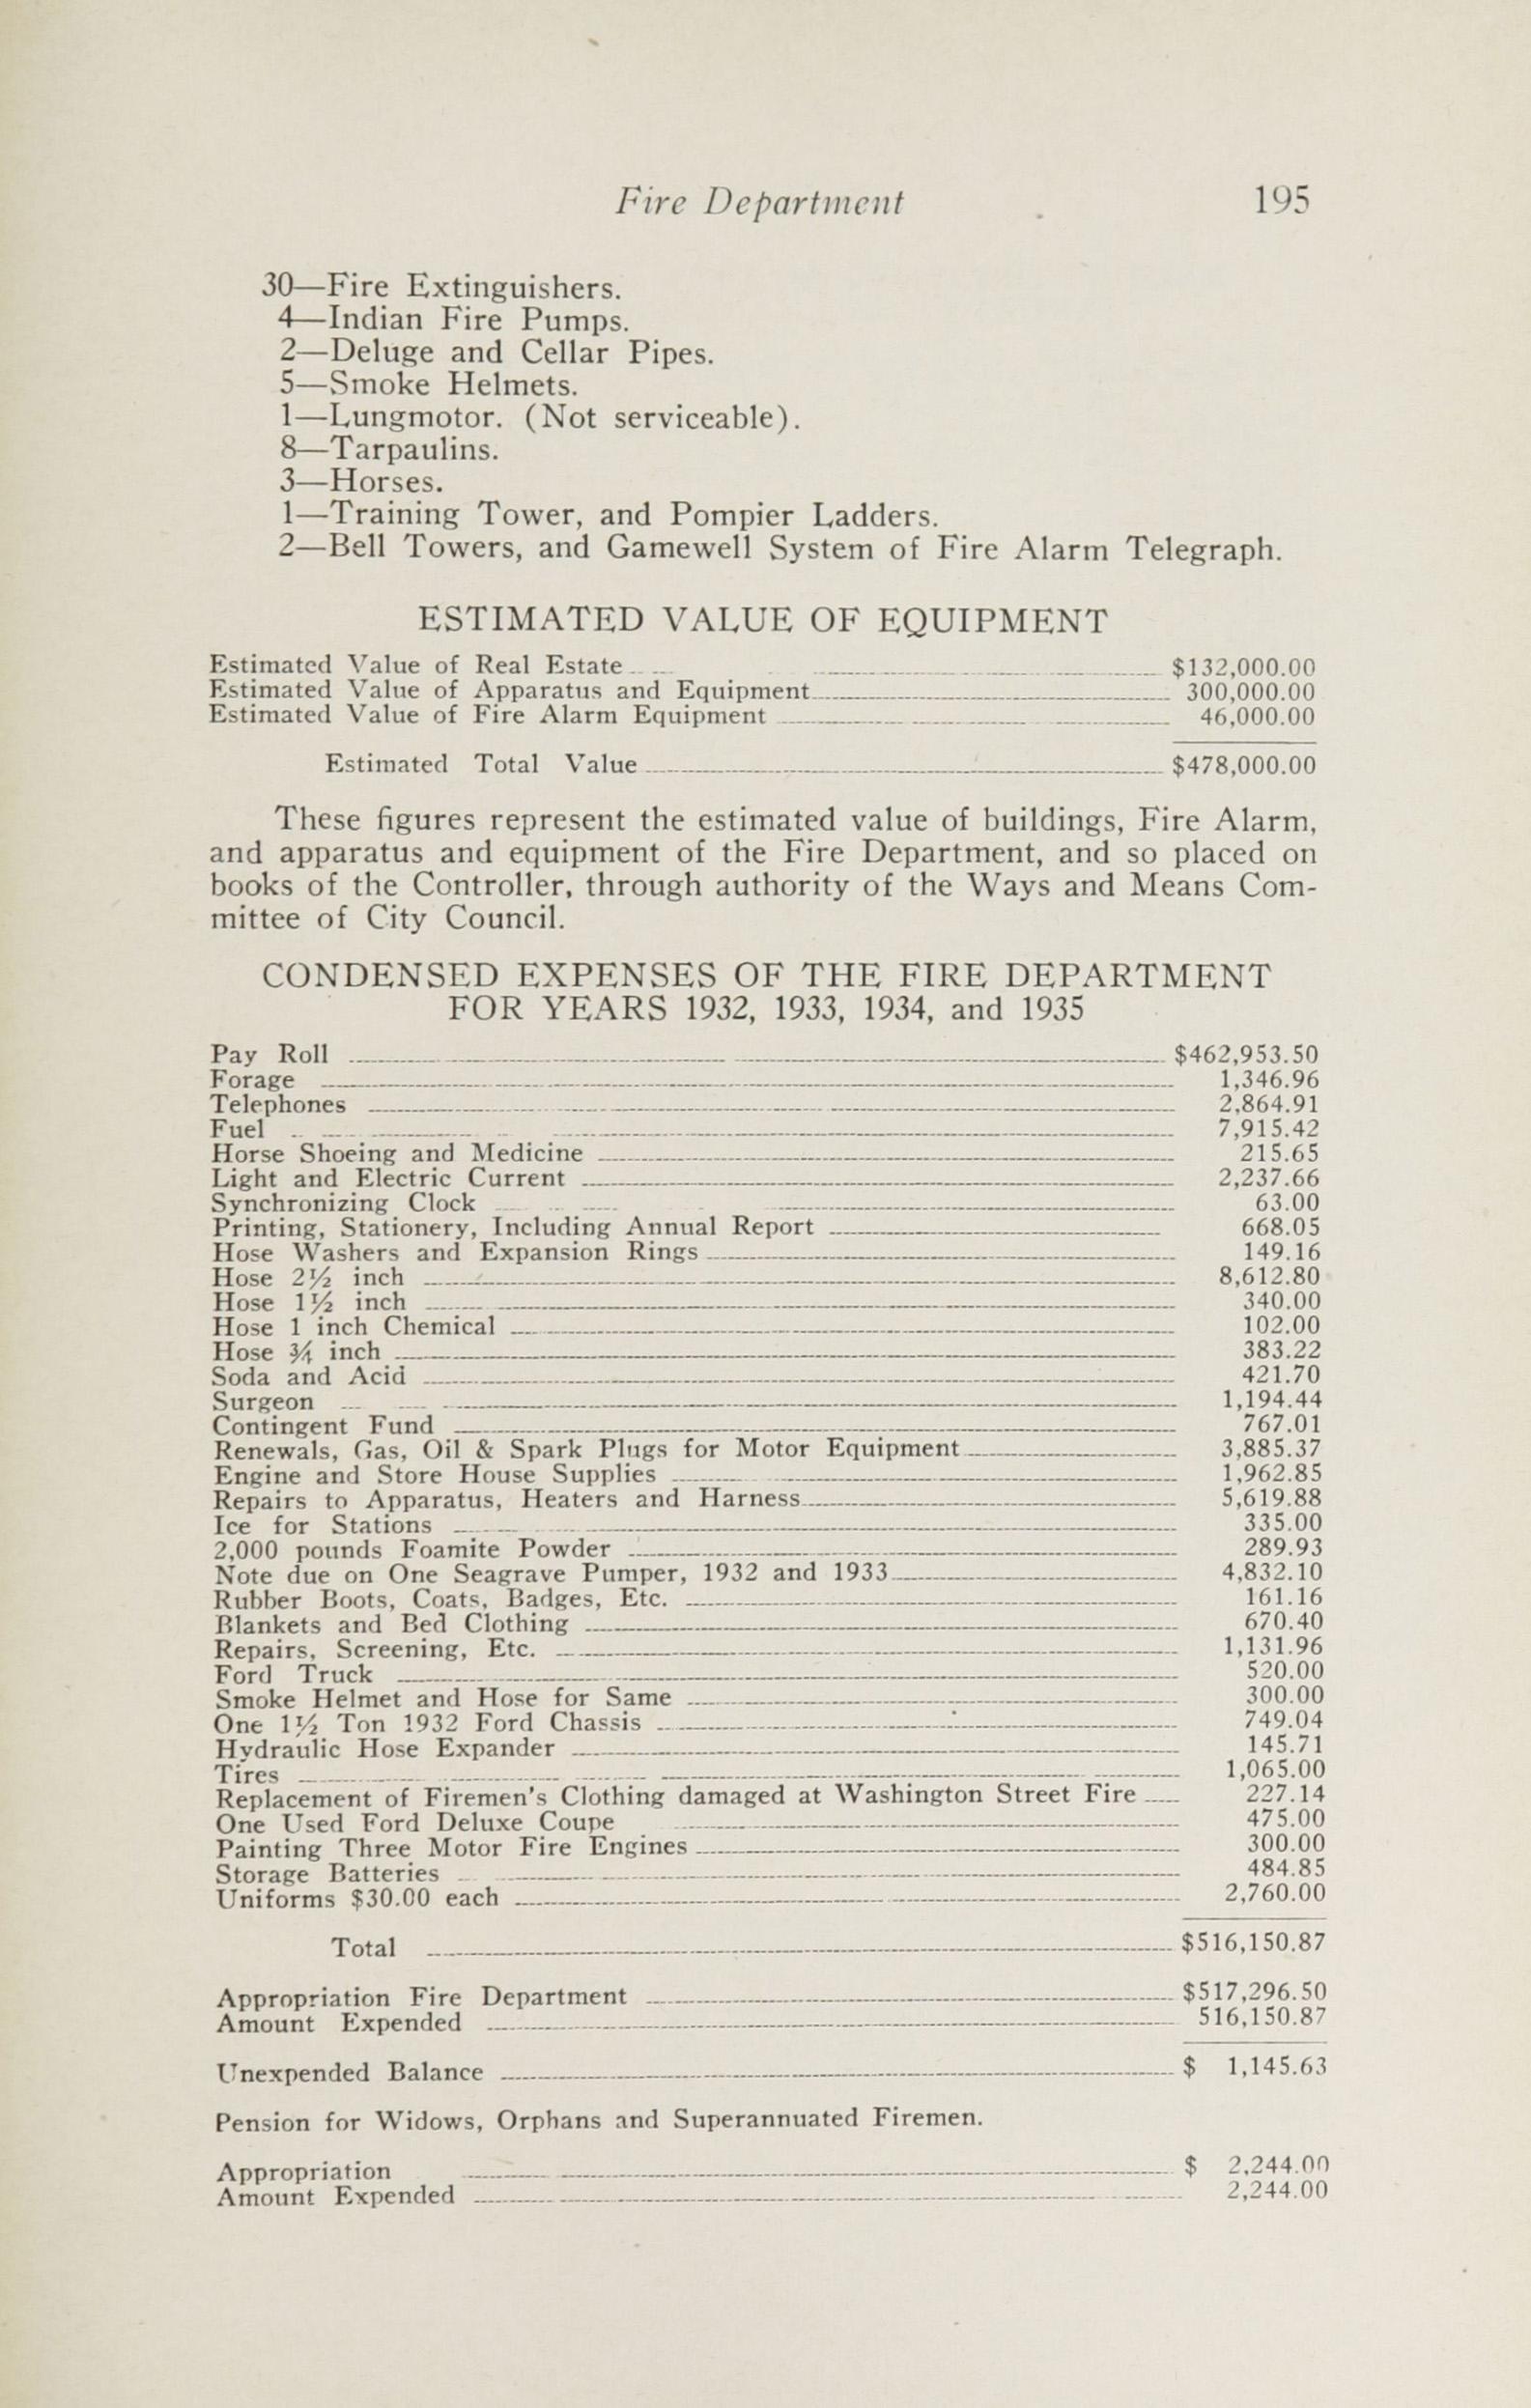 Charleston Yearbook, 1932-1935, page 195